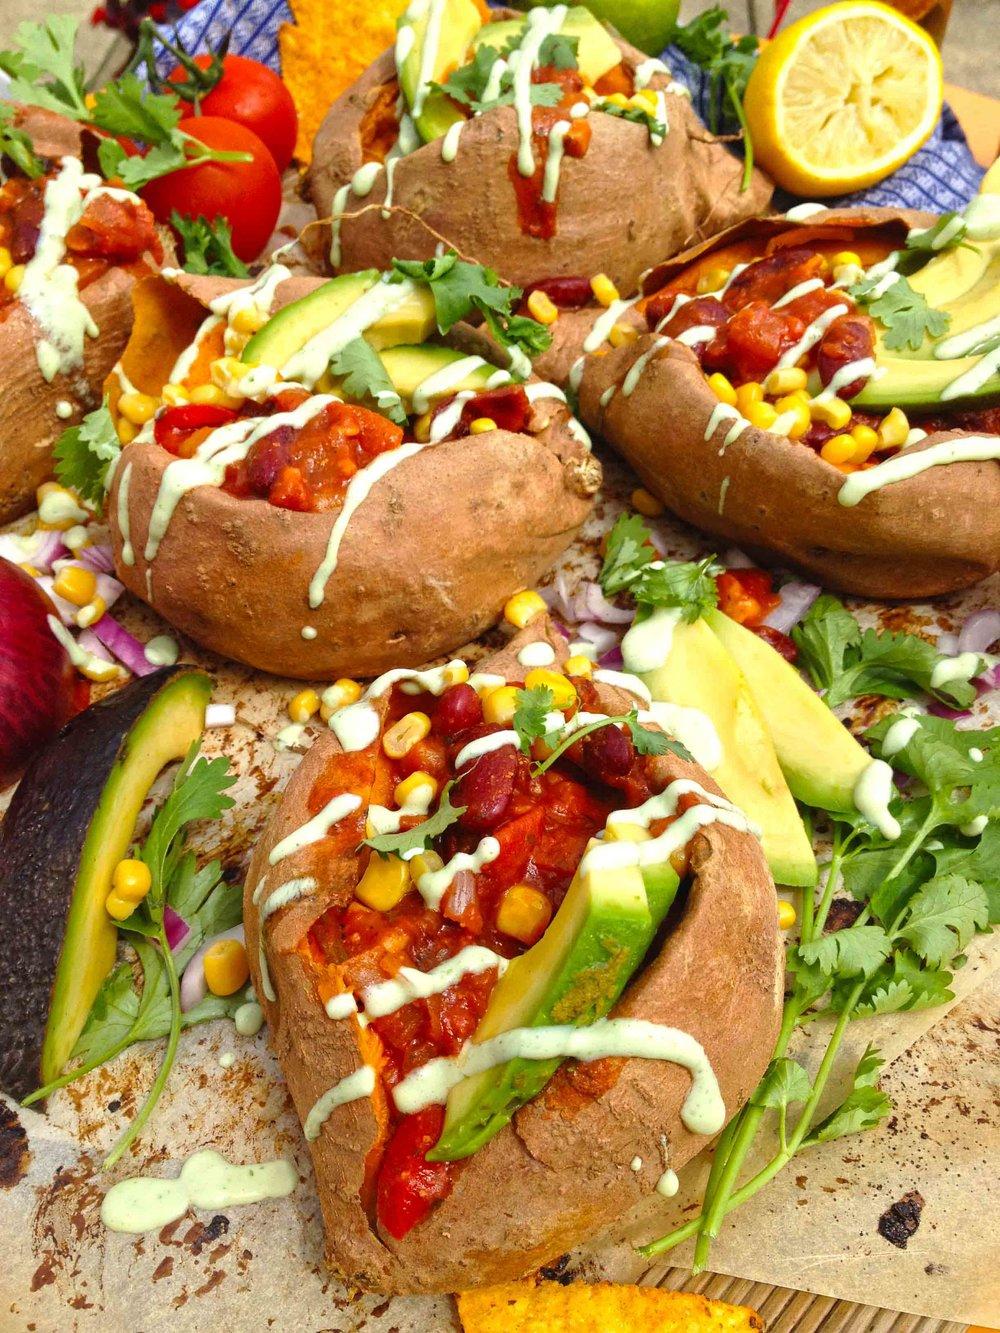 baked loaded mexican Sweet Potatoes yams vegan .jpg